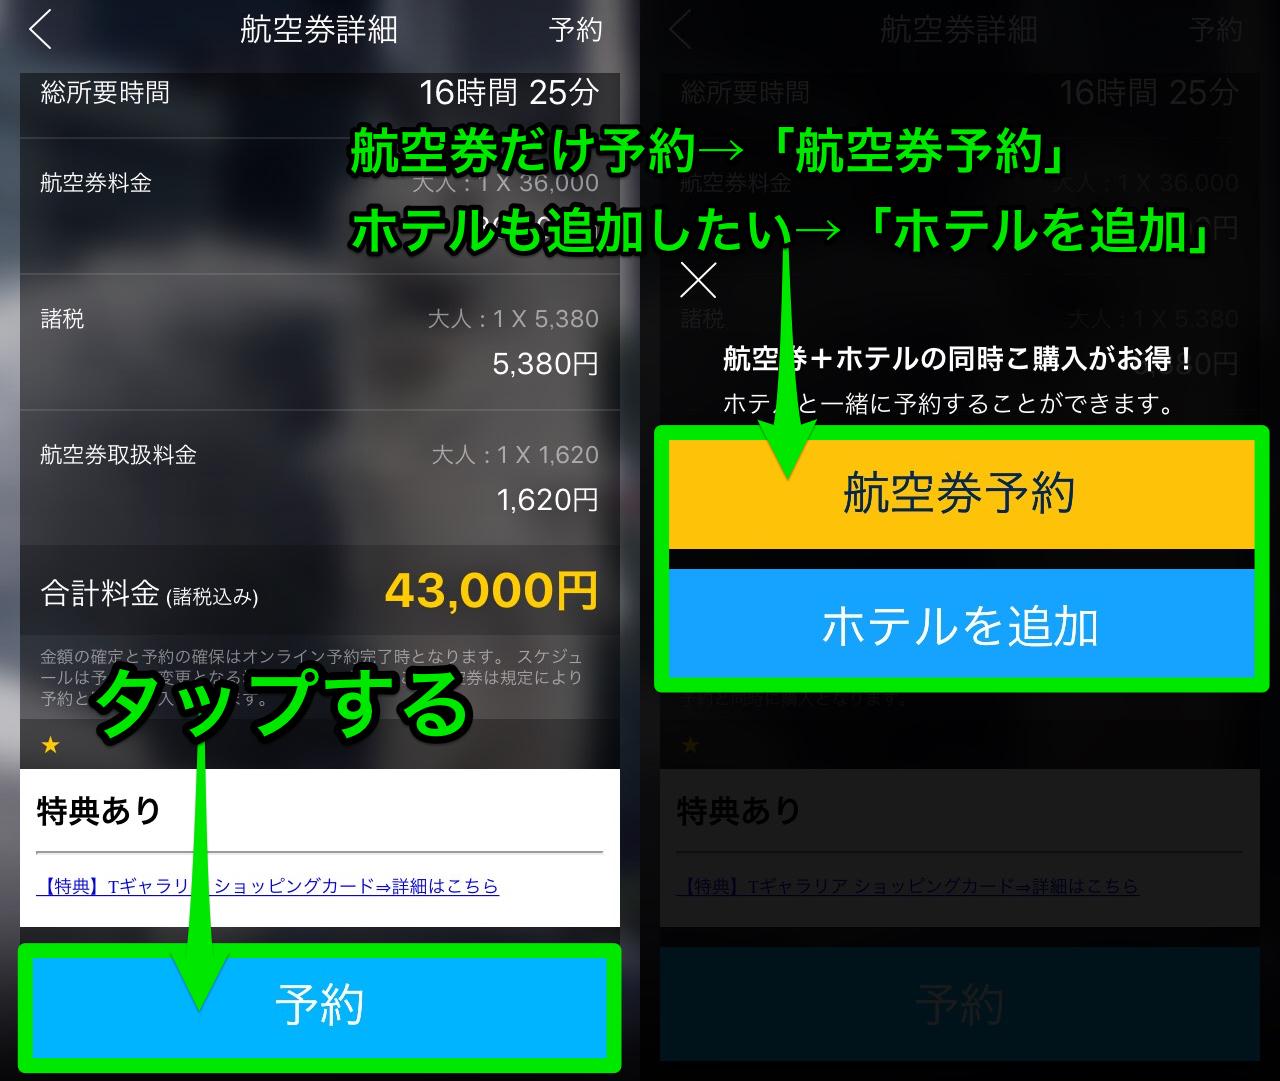 H.I.S.アプリ「航空券・ホテル」で航空券予約するかホテルを追加するか